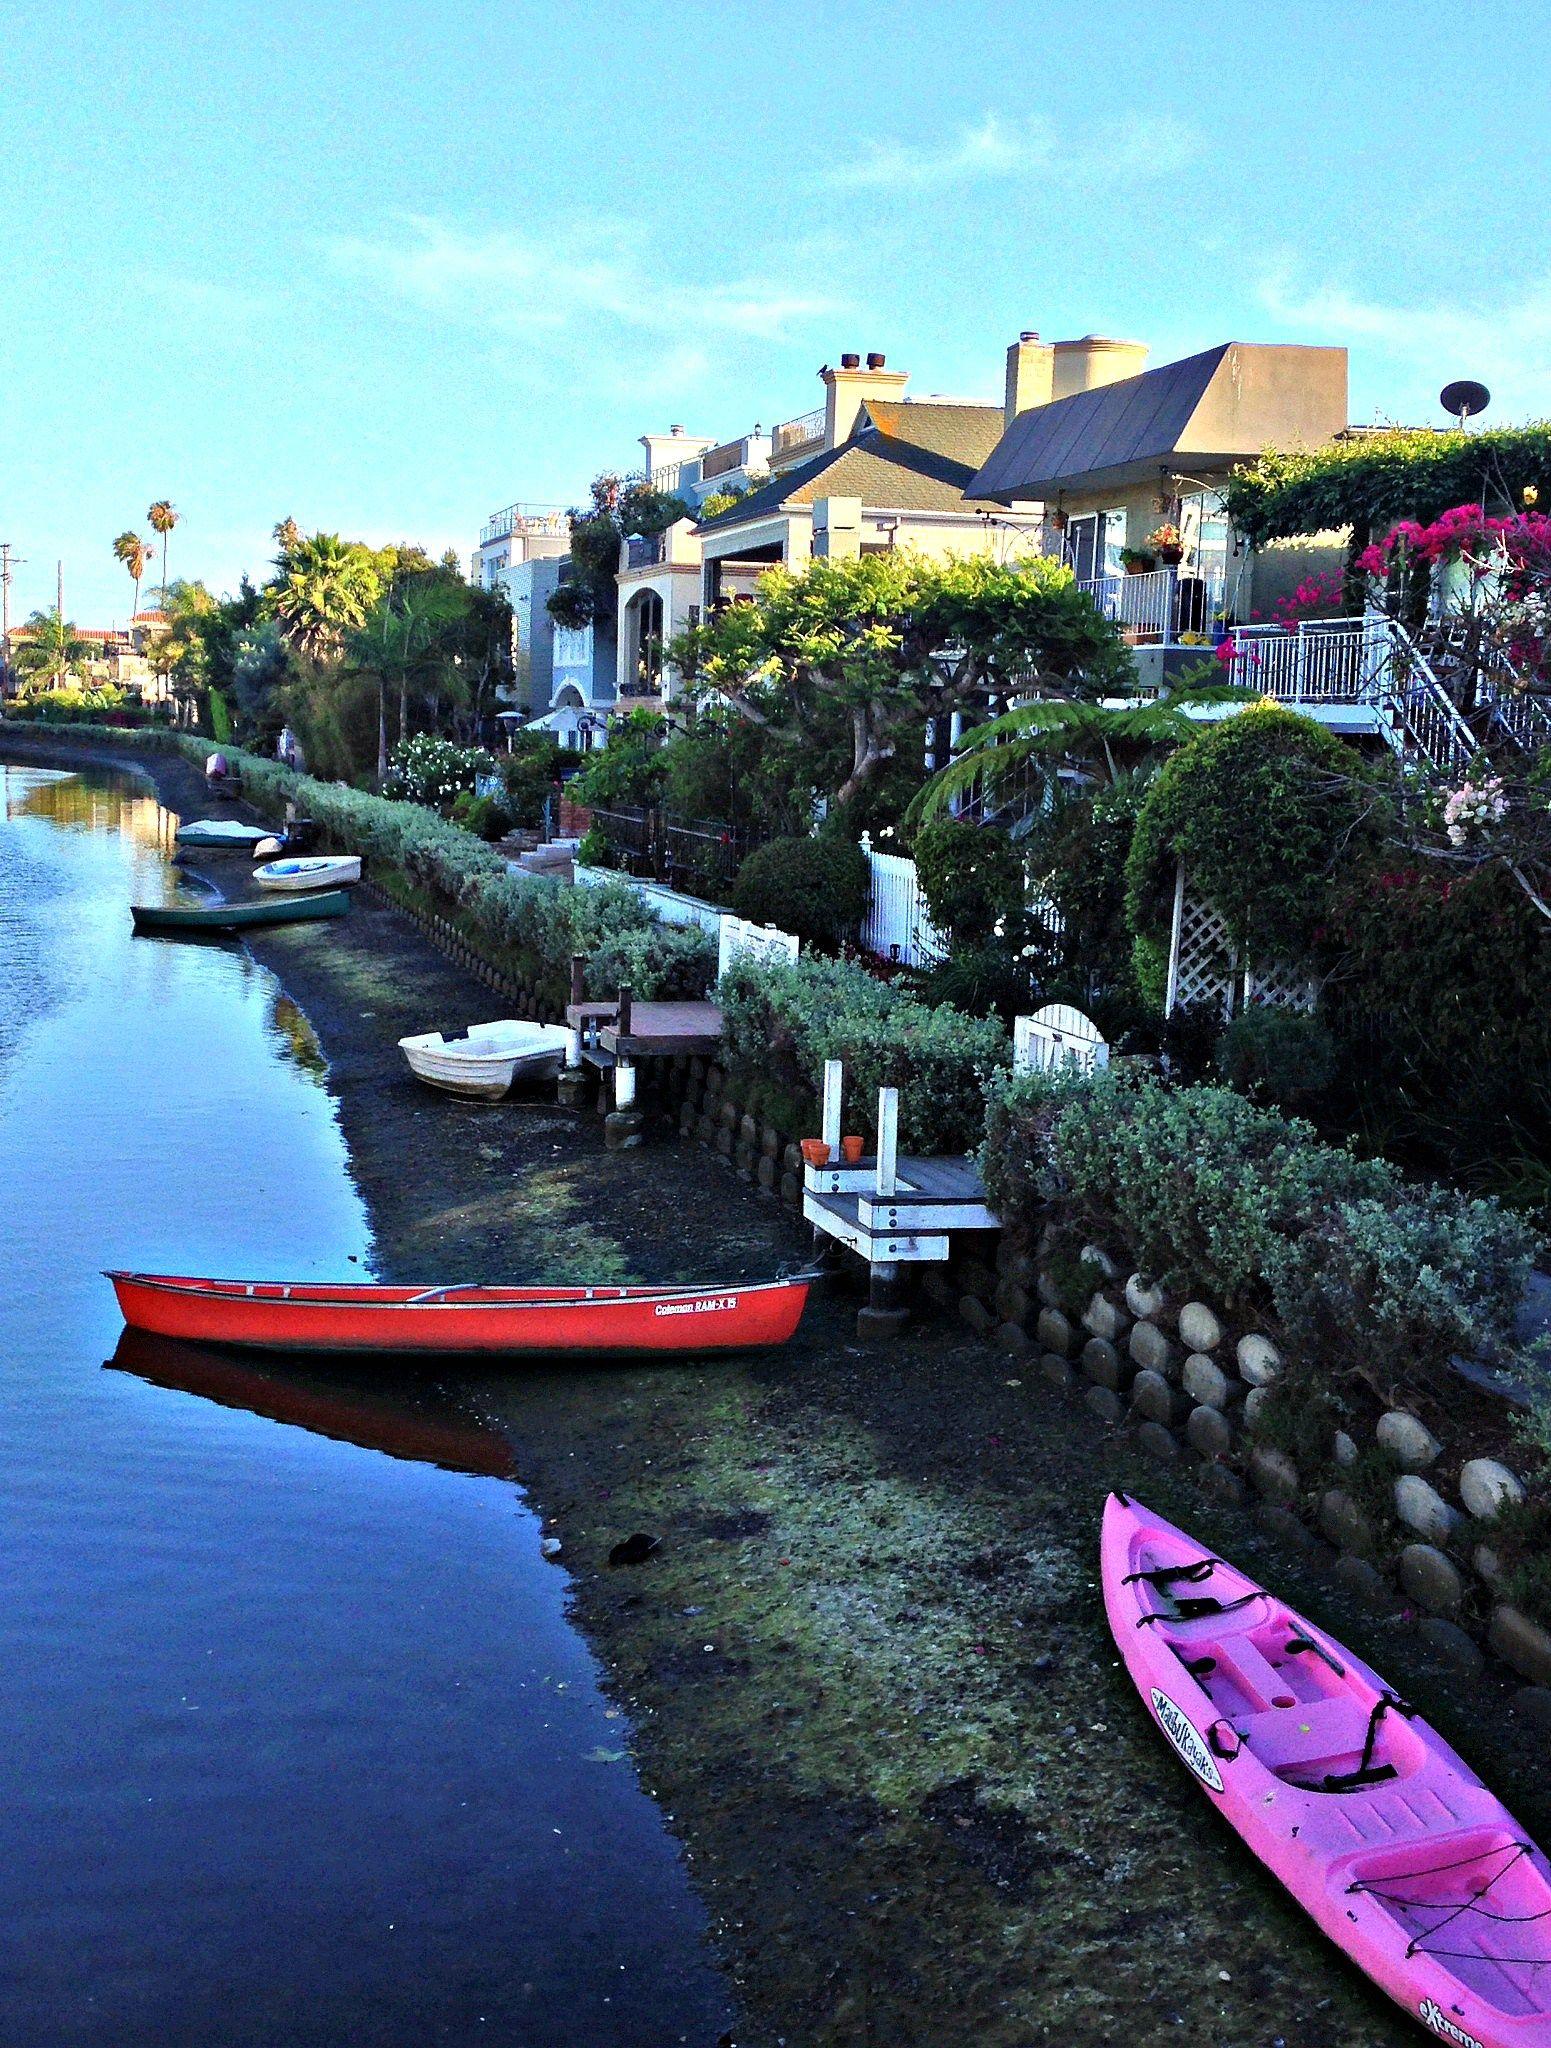 Vacation Rental Of The Week Venice Beach House Smithhonig Venice Beach California Venice Beach Venice Beach House